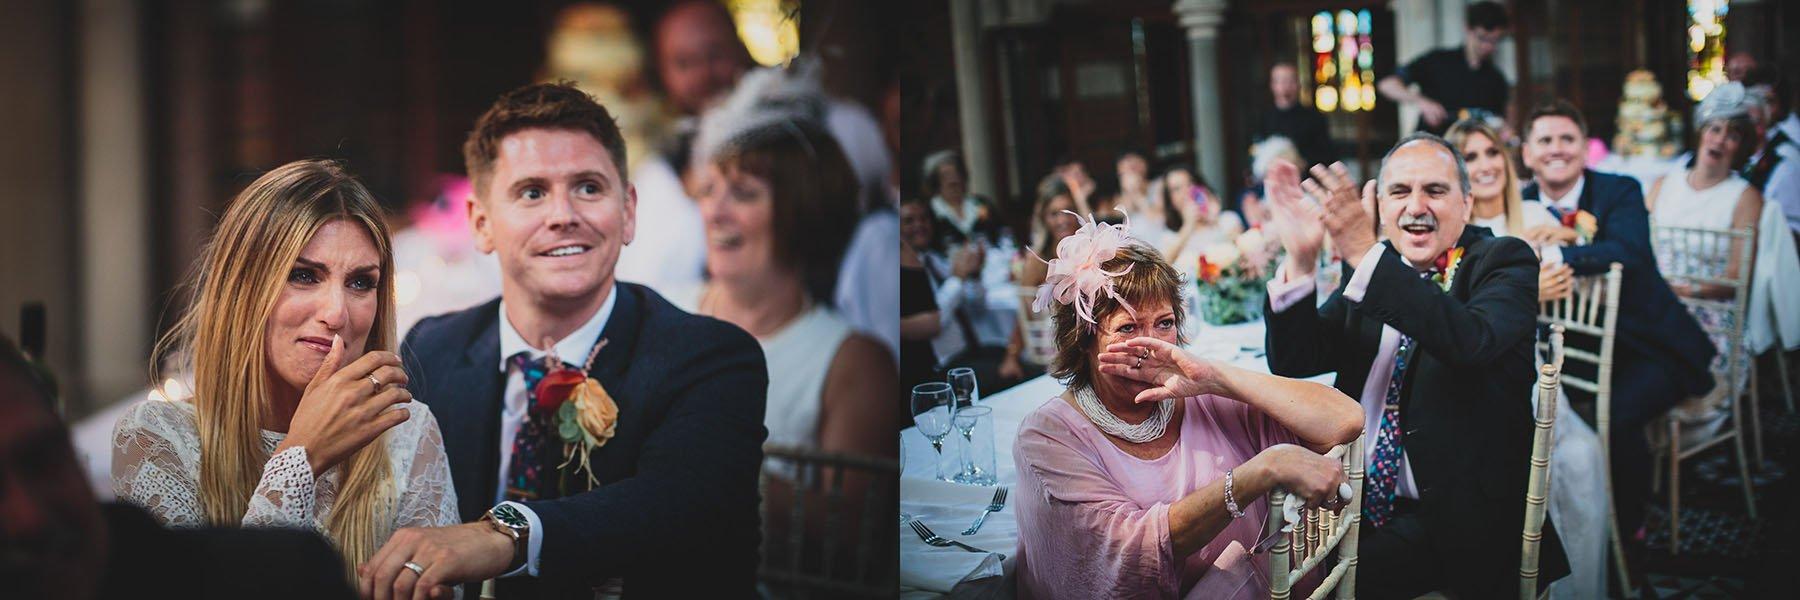 eastbourne-wedding-photography-hannah-tom-061